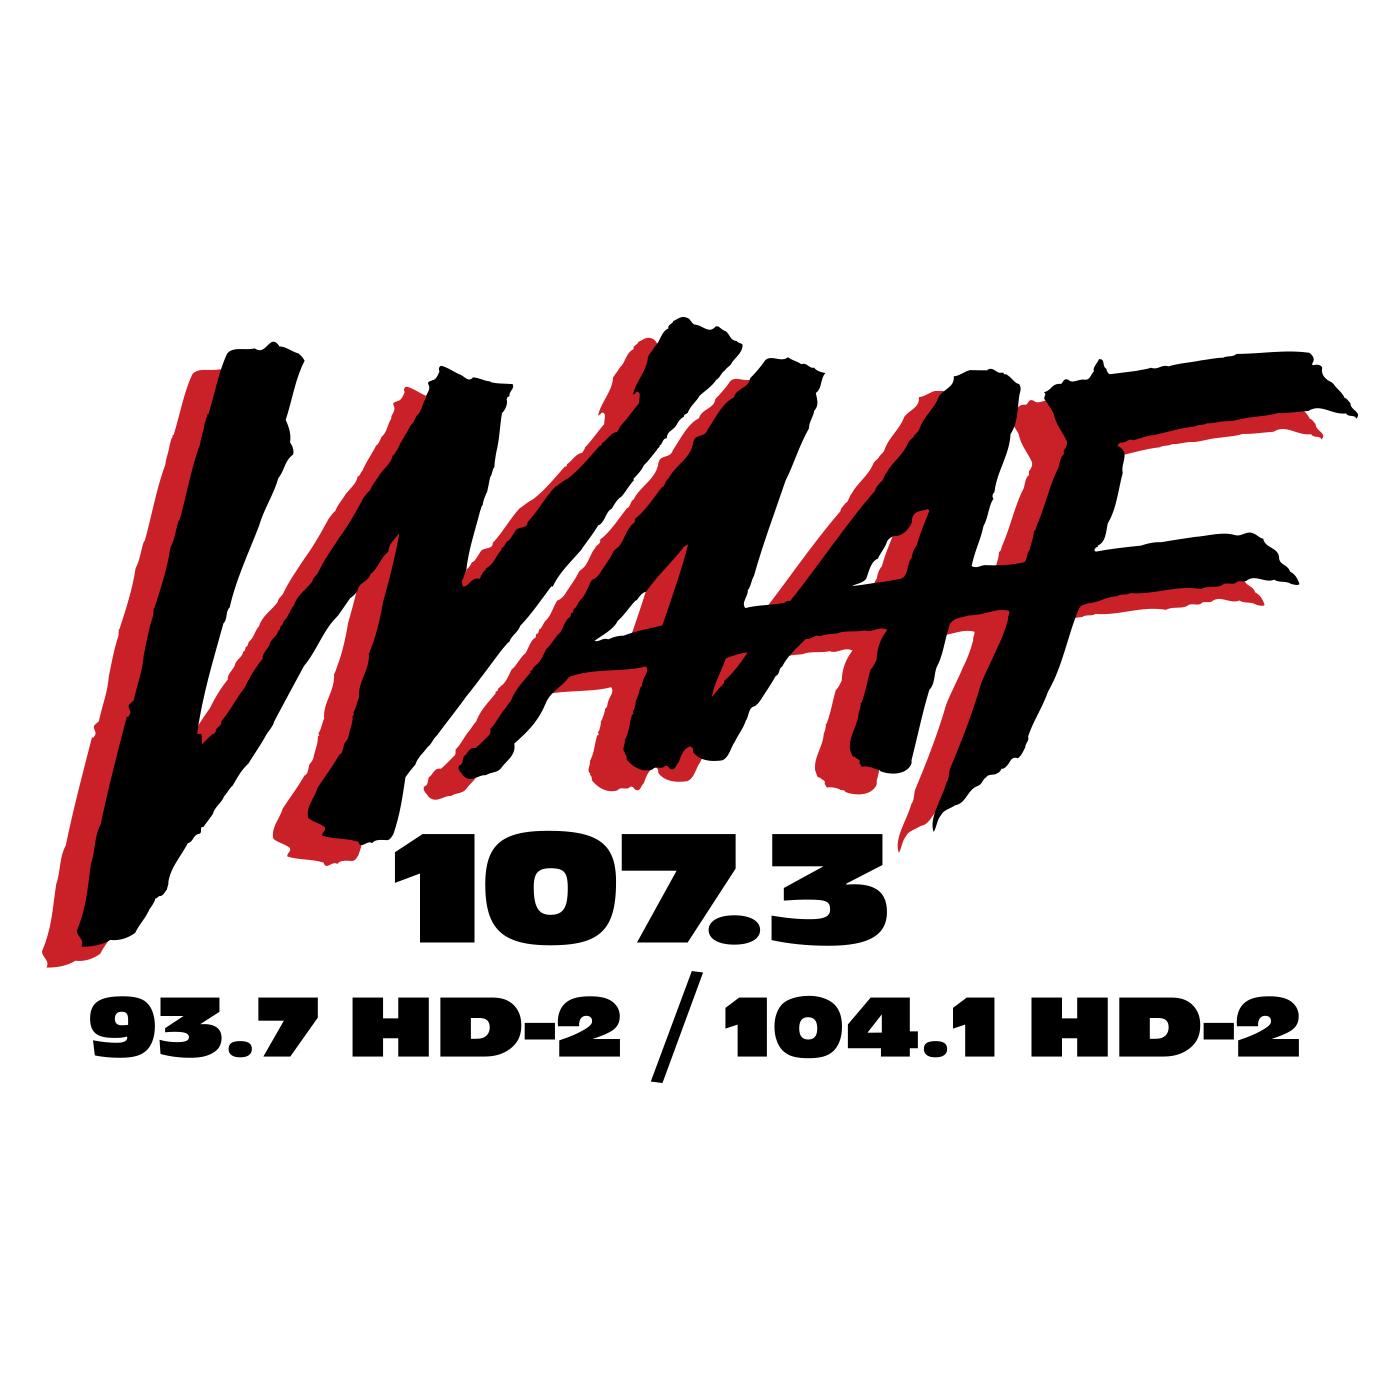 Boston Radio Stations >> Weei 93 7 On Radio Com Listen To Free Radio Online Music Sports